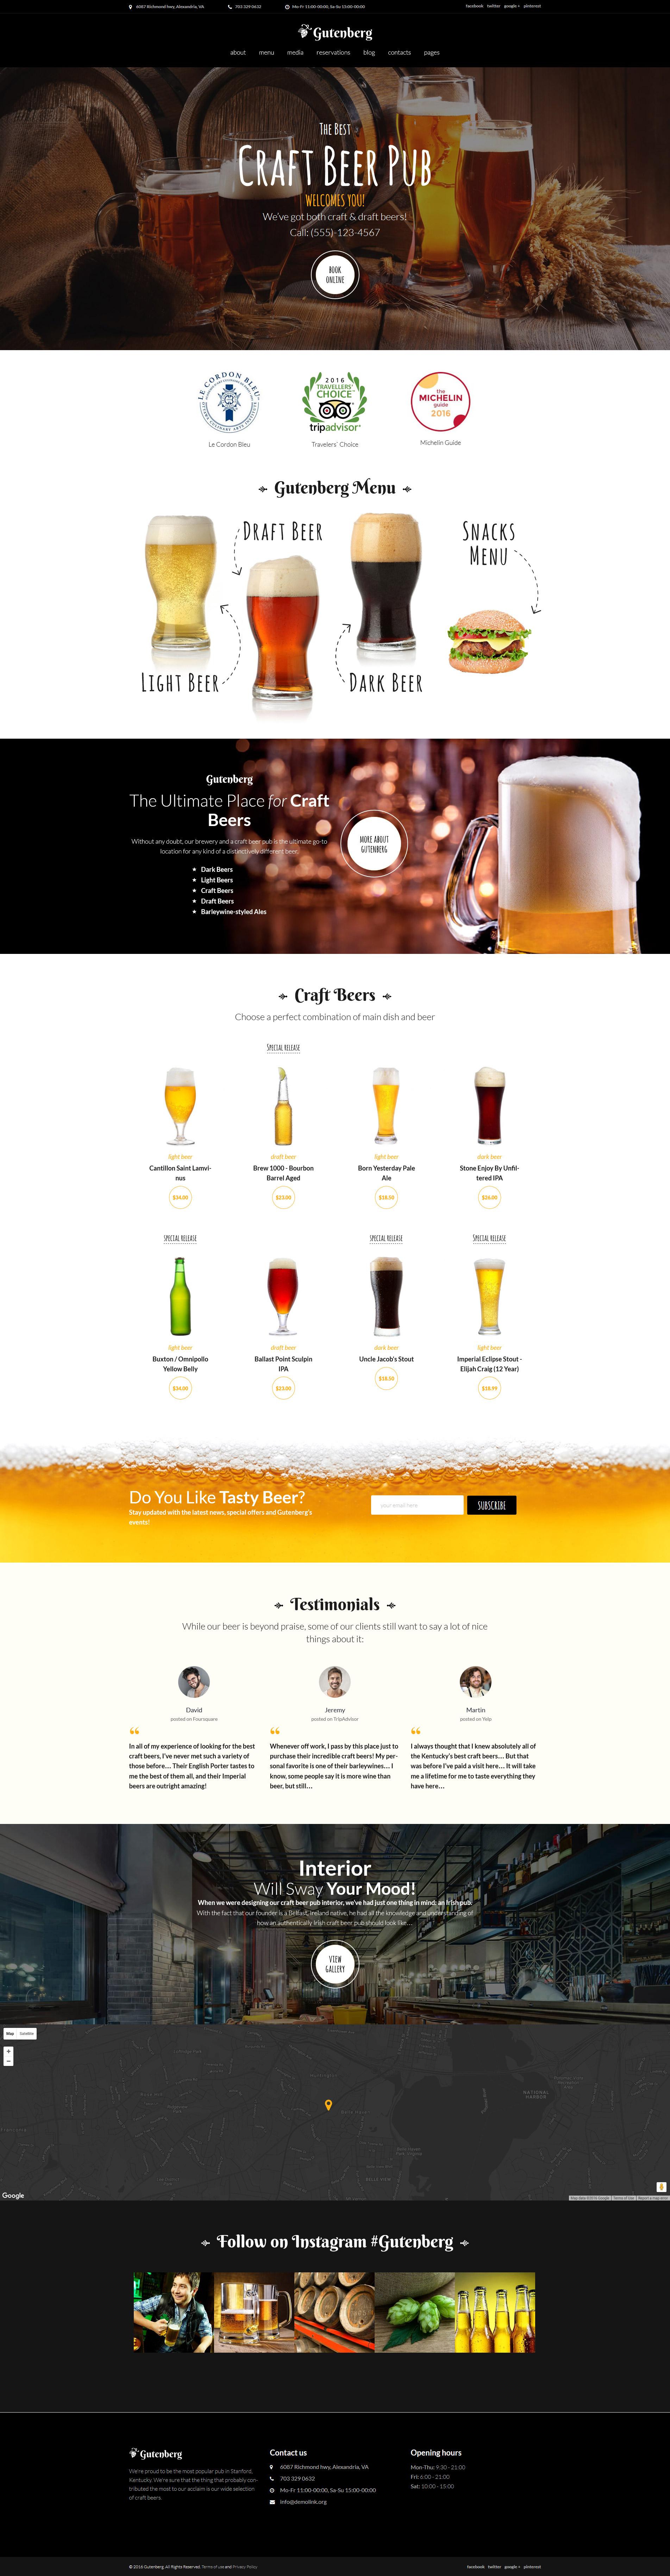 "Template WordPress Responsive #59005 ""GutenBerg - Beer Pub and Brewery"""